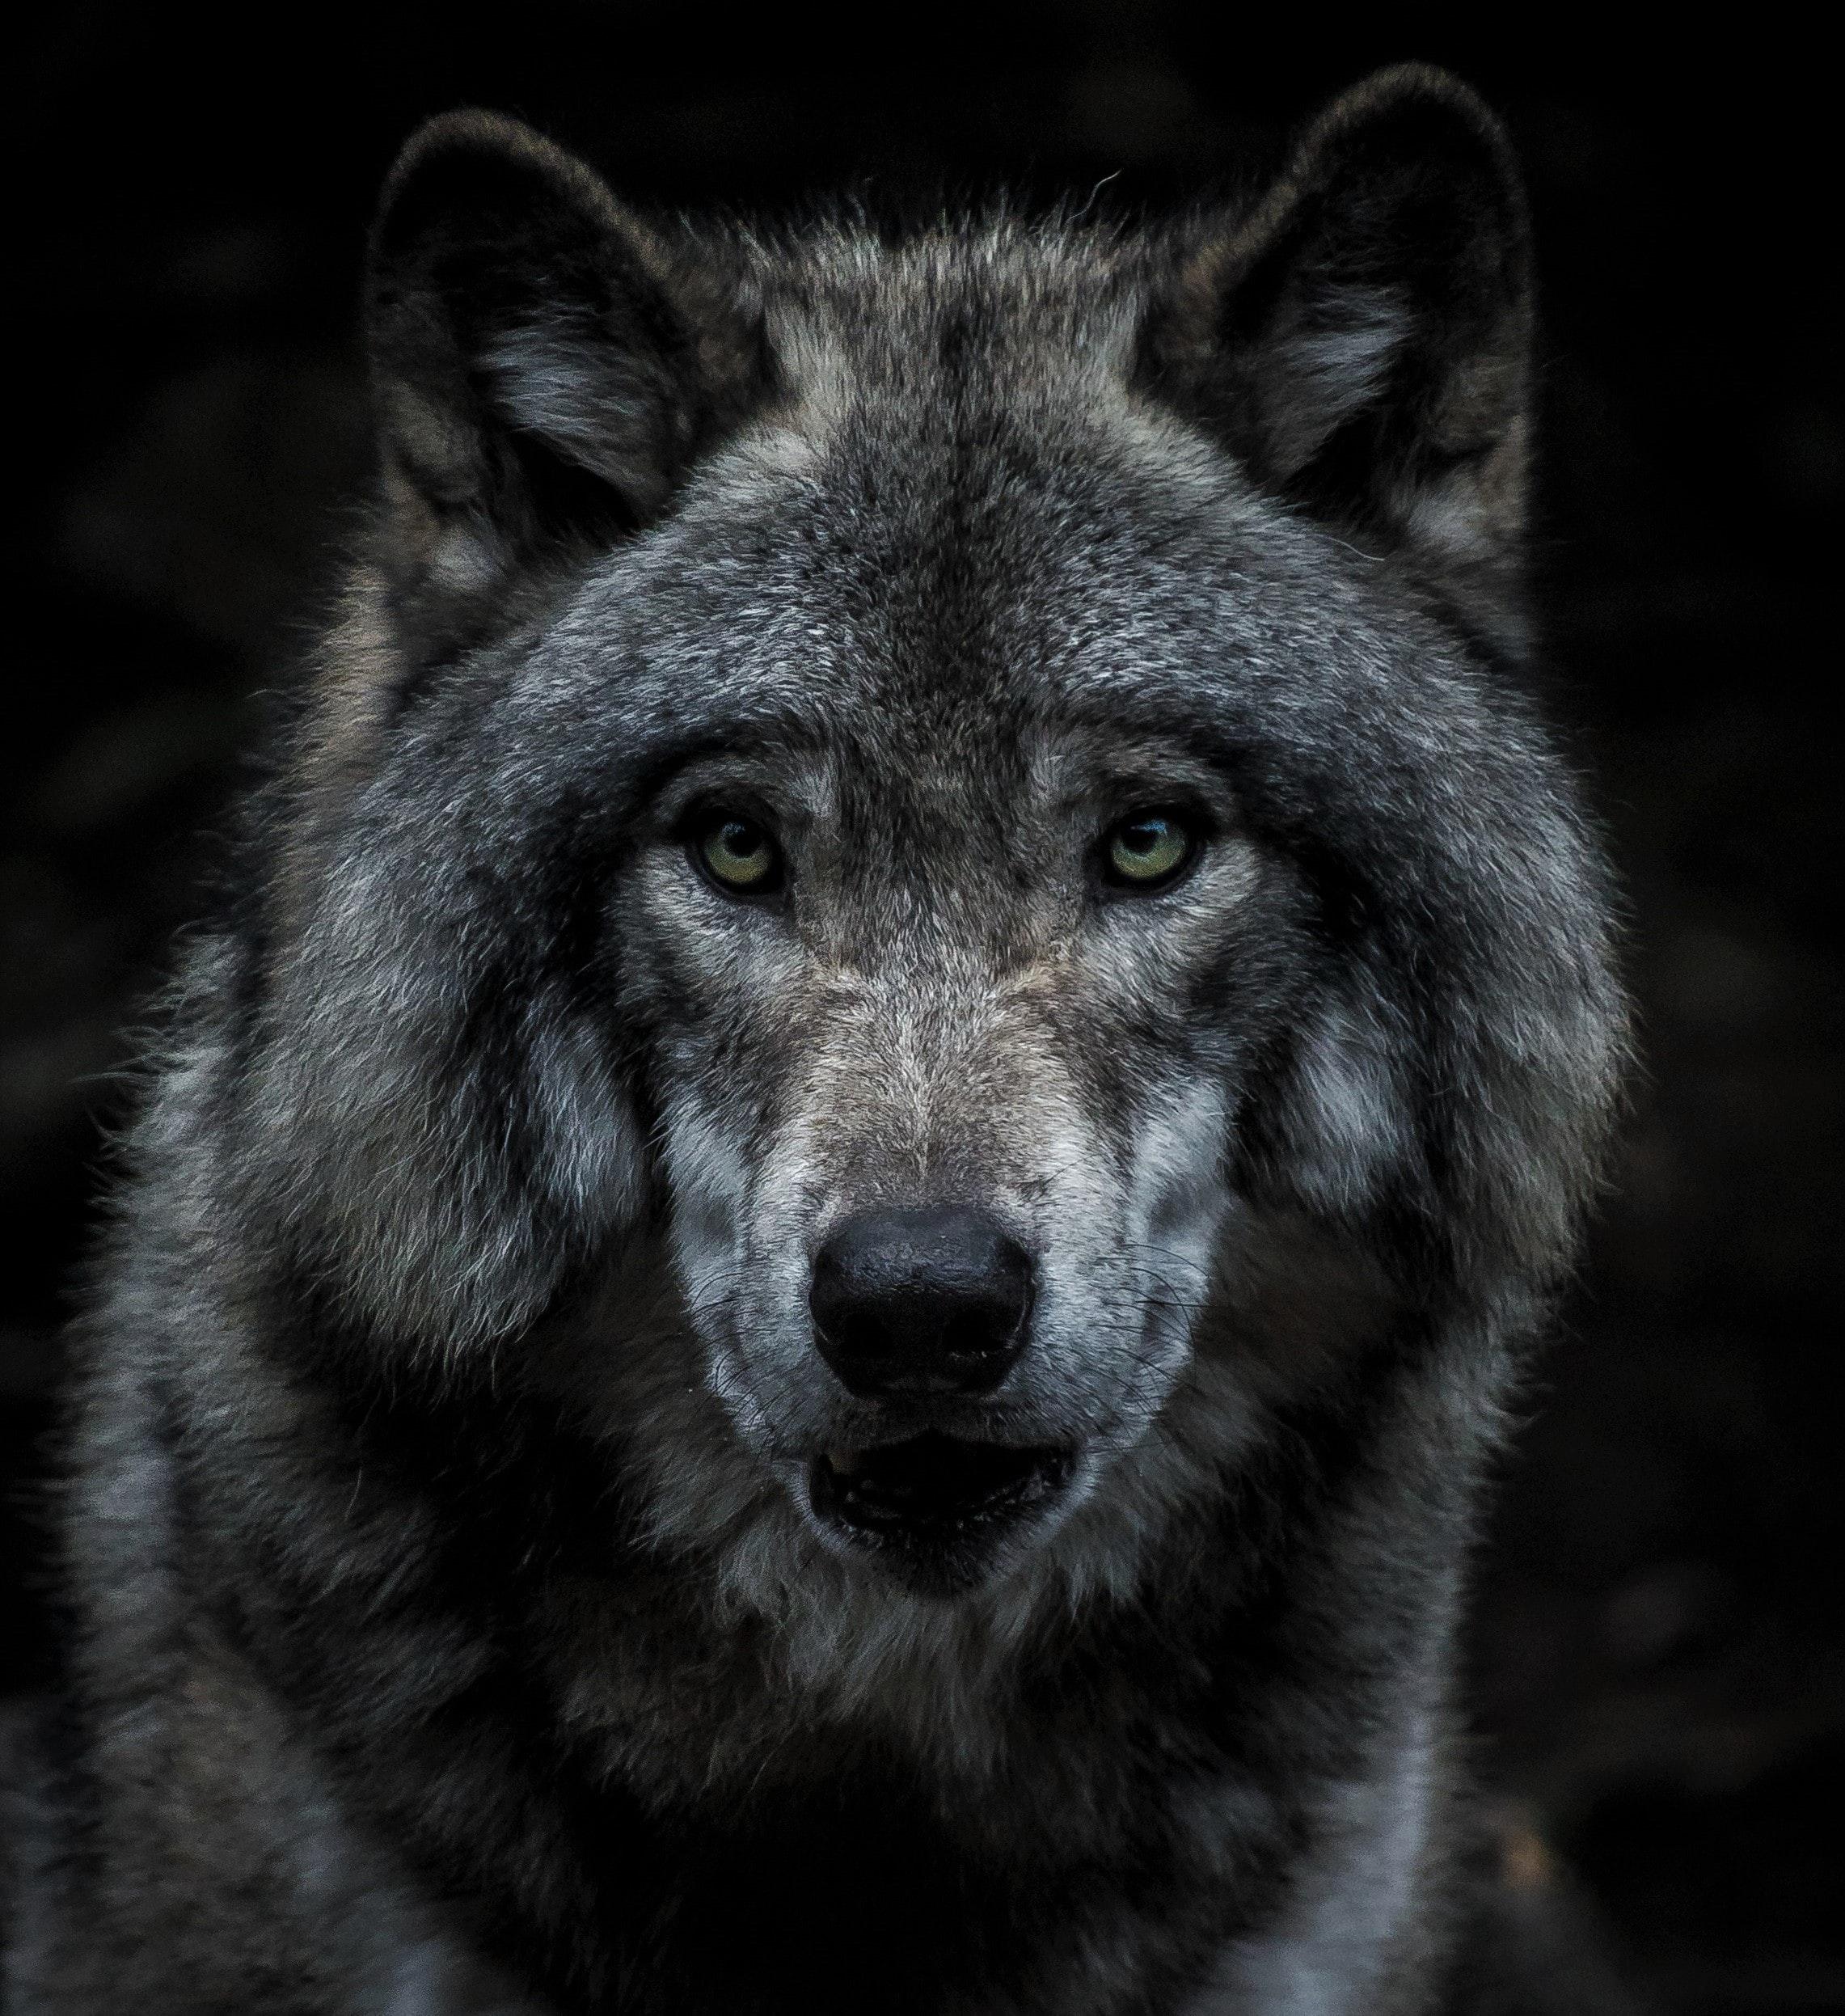 marc-olivier-jodoin-Wolf up close-unsplash